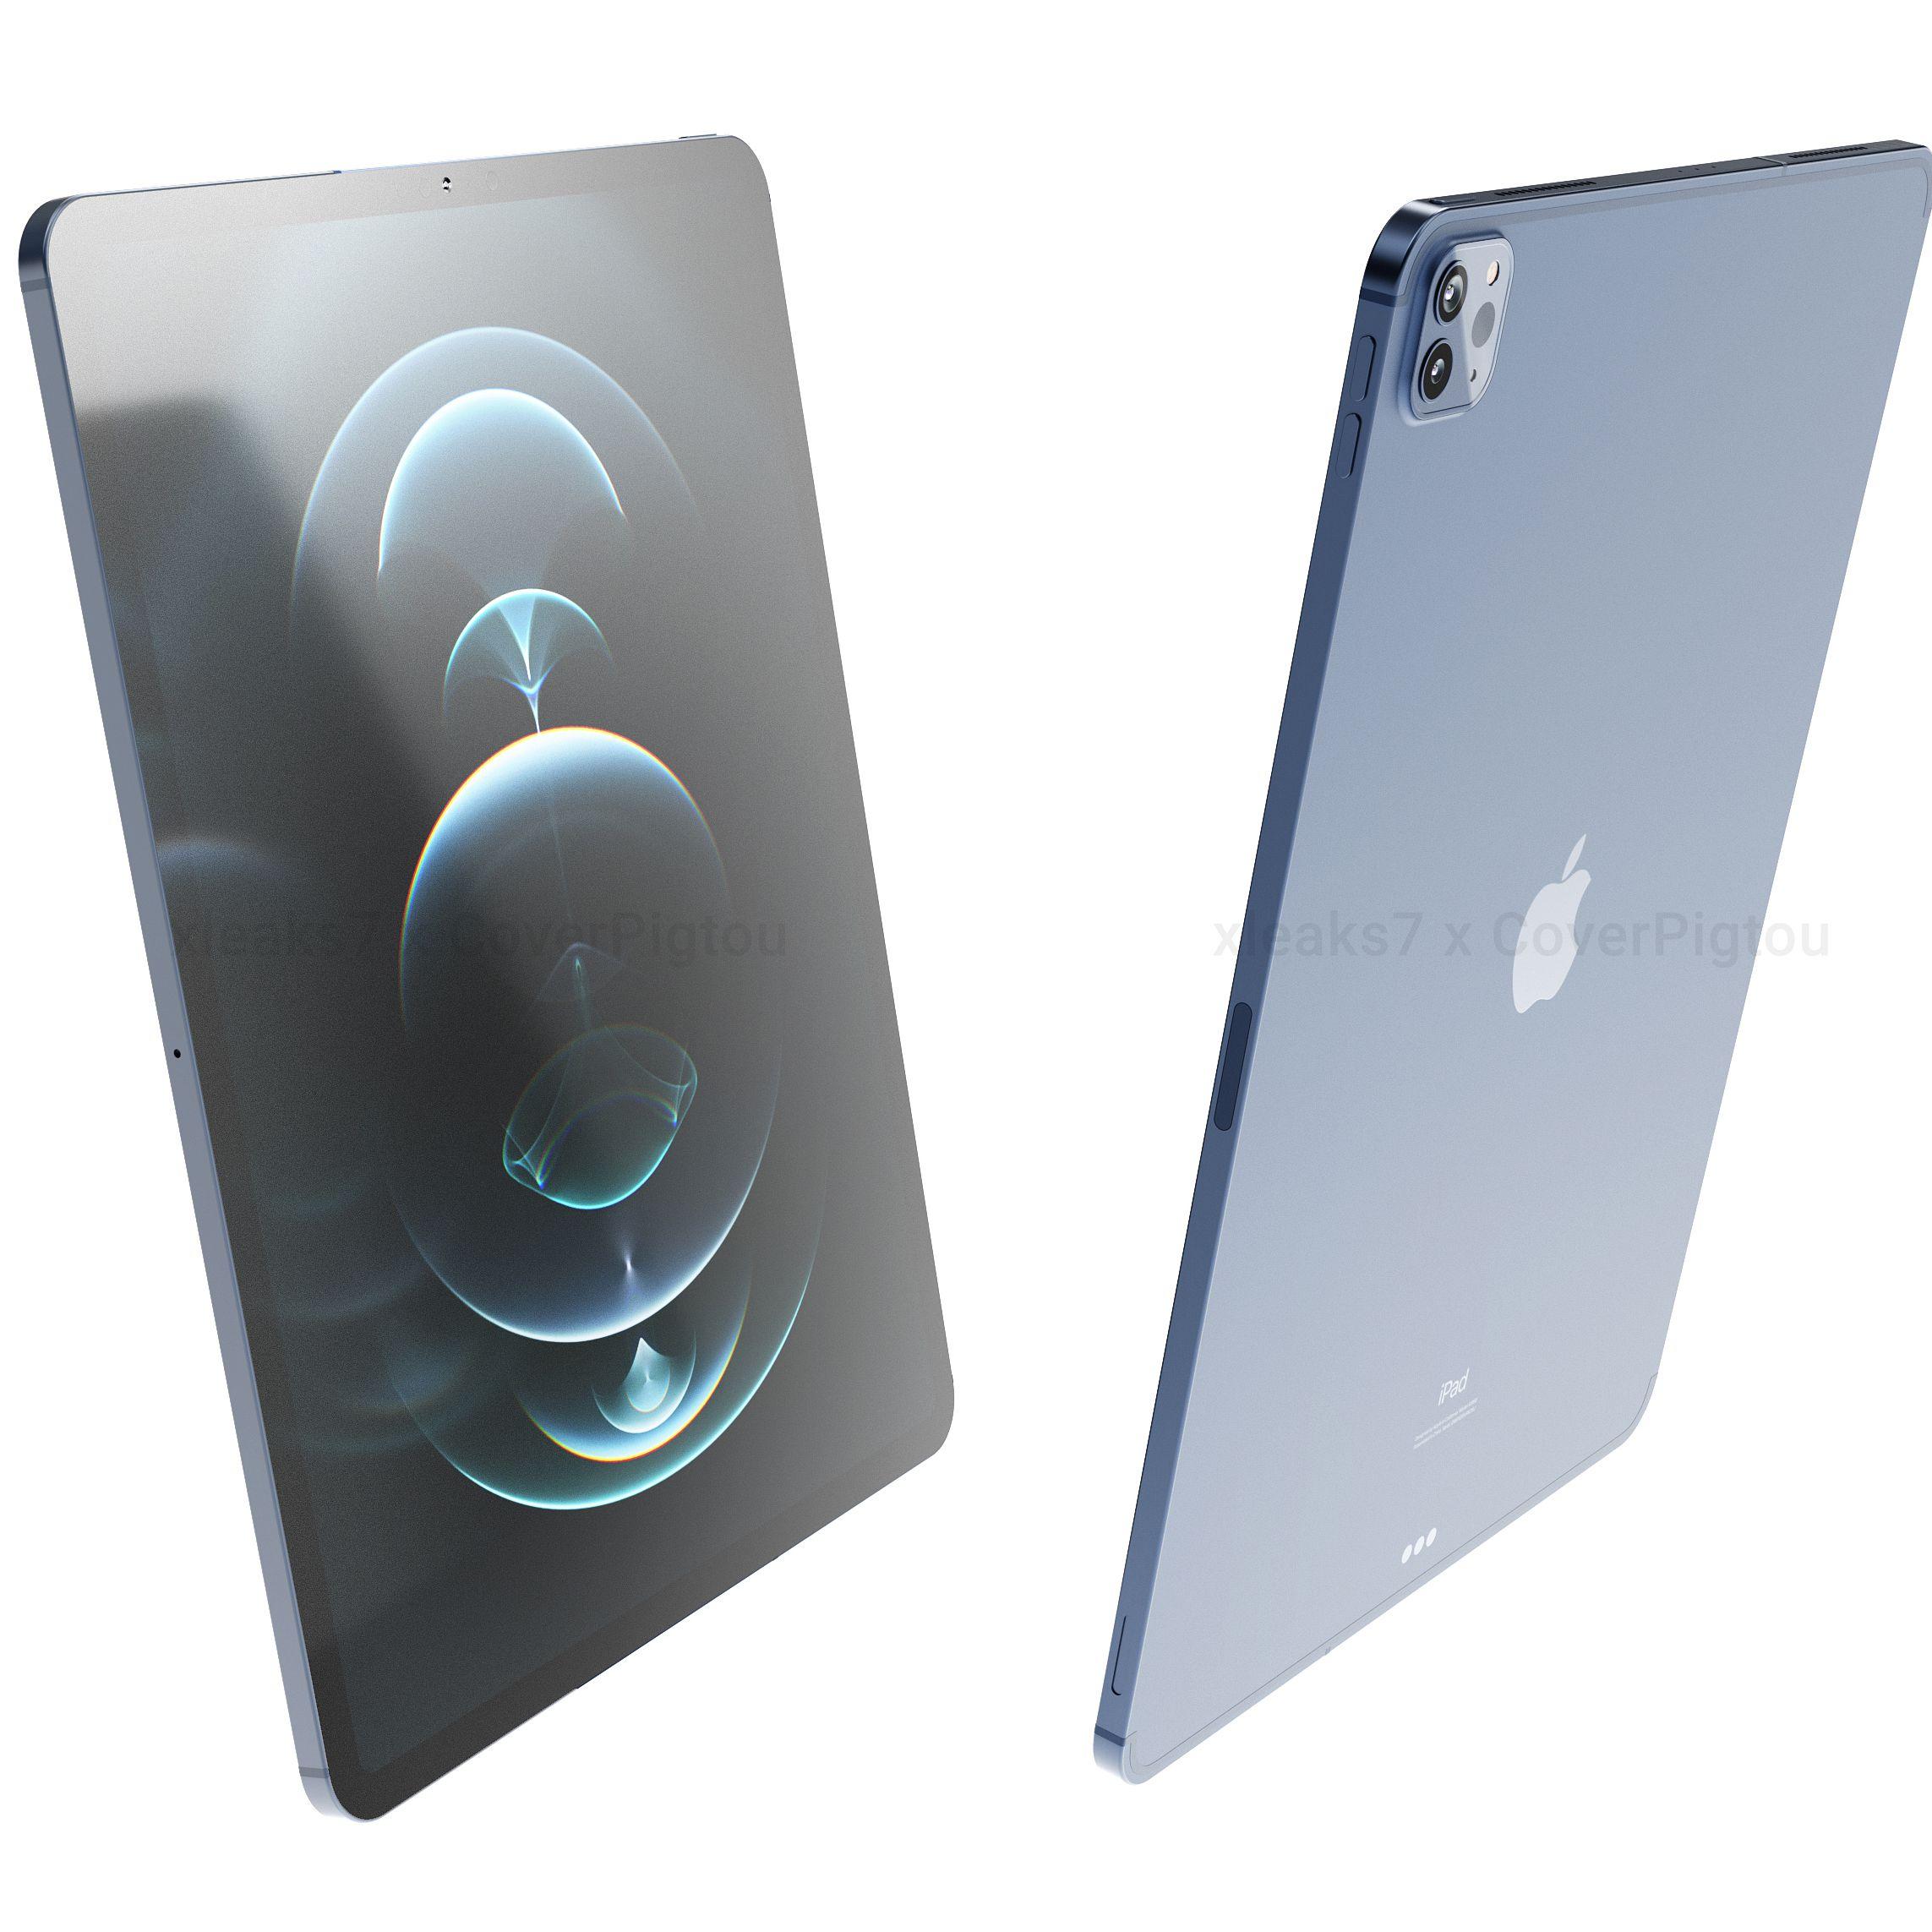 2021 iPad Pro 1